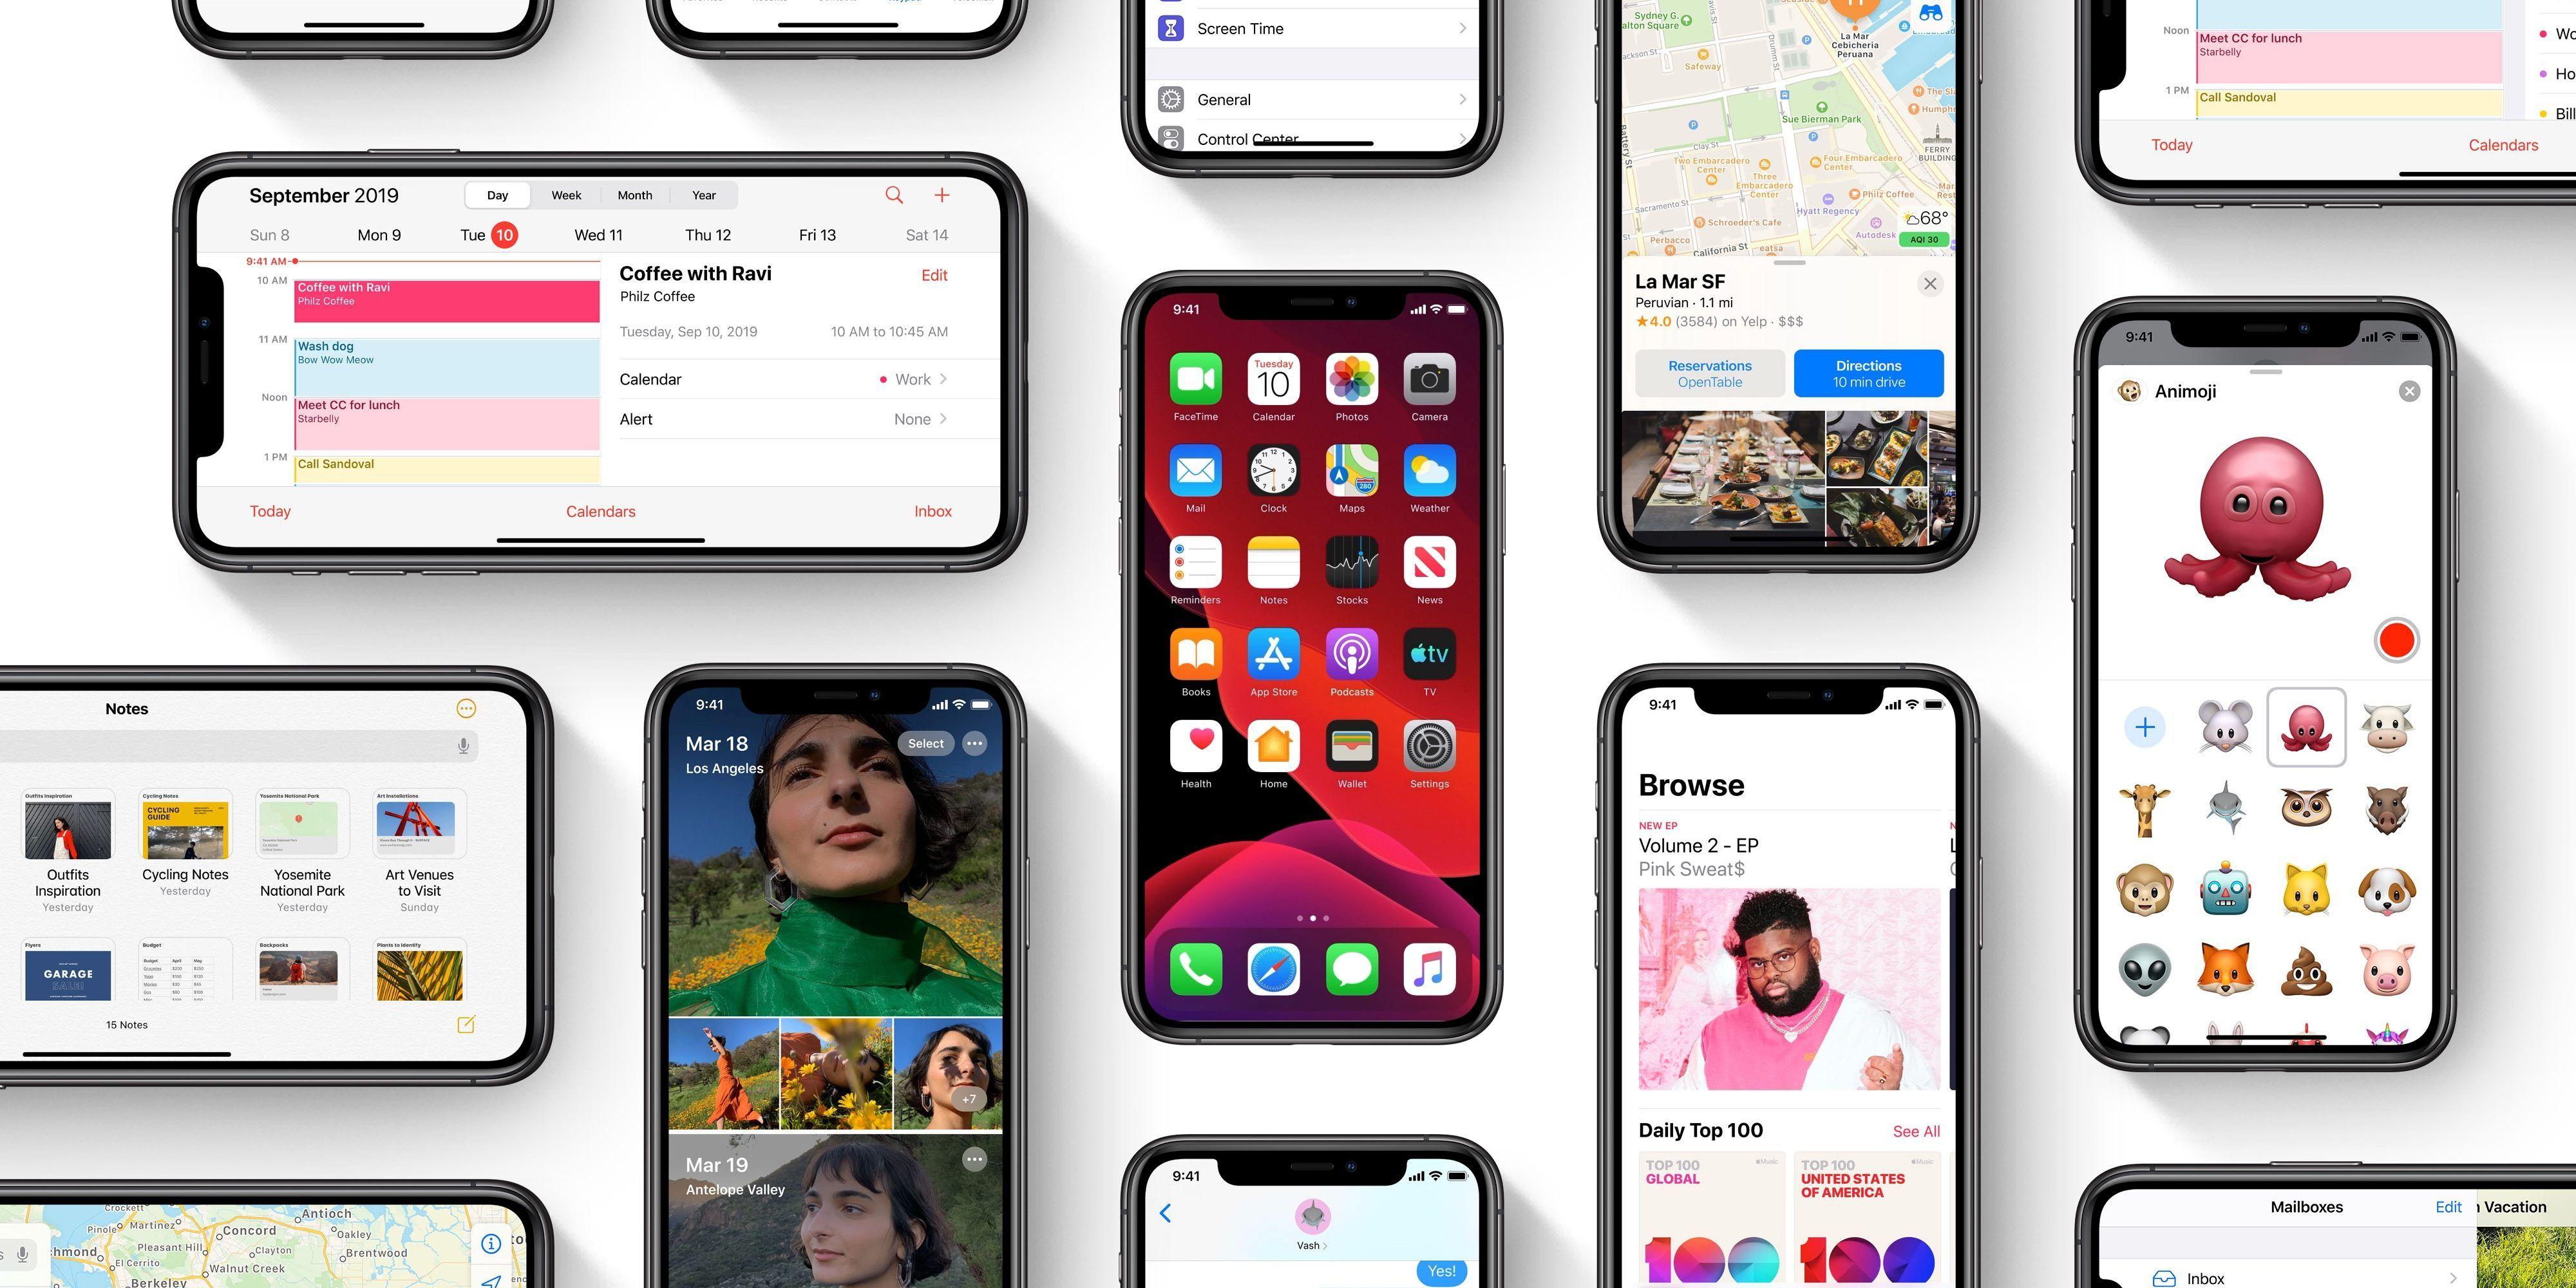 Apple now allows push notification advertising updates